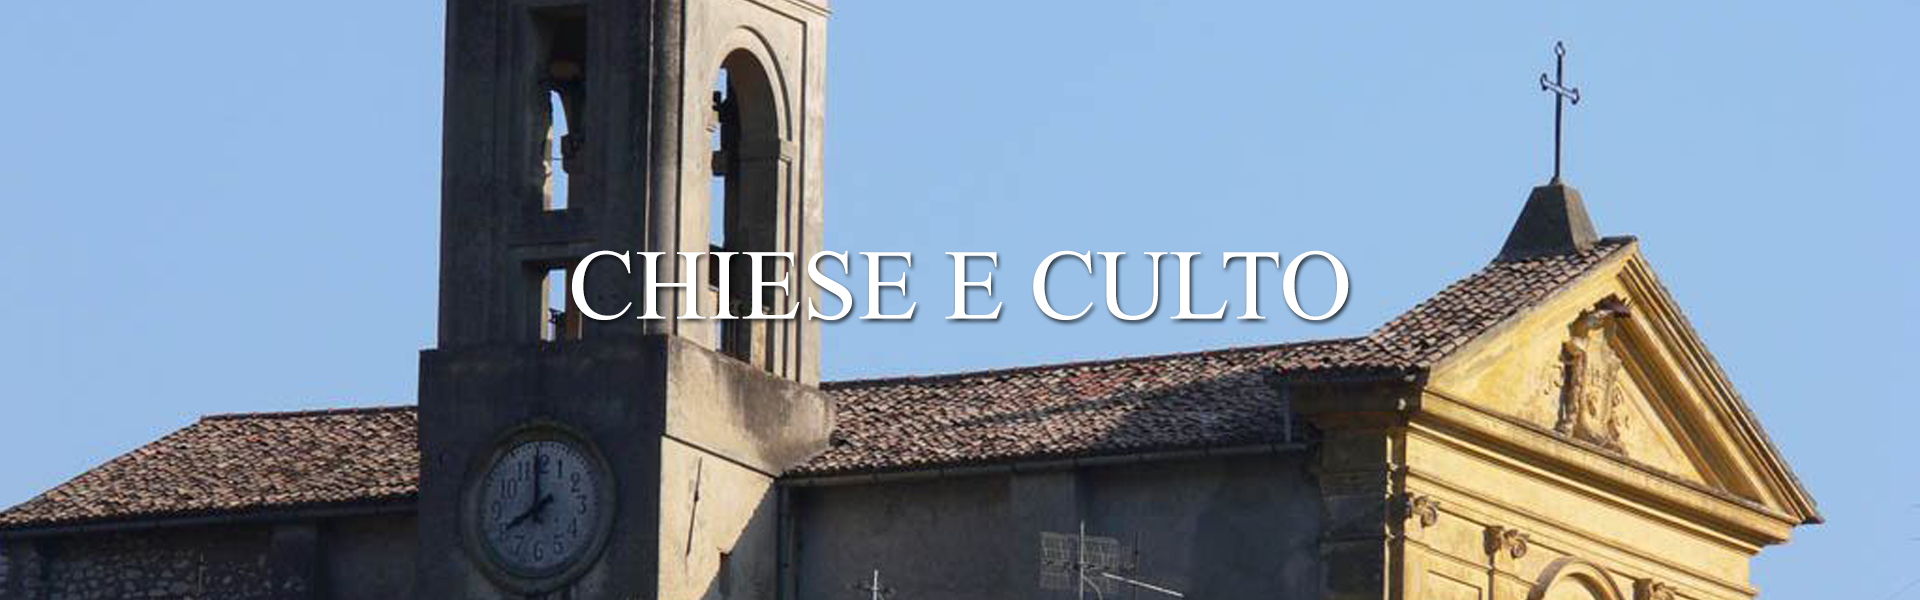 montelanico-cultura-chieseeculto-1920x600